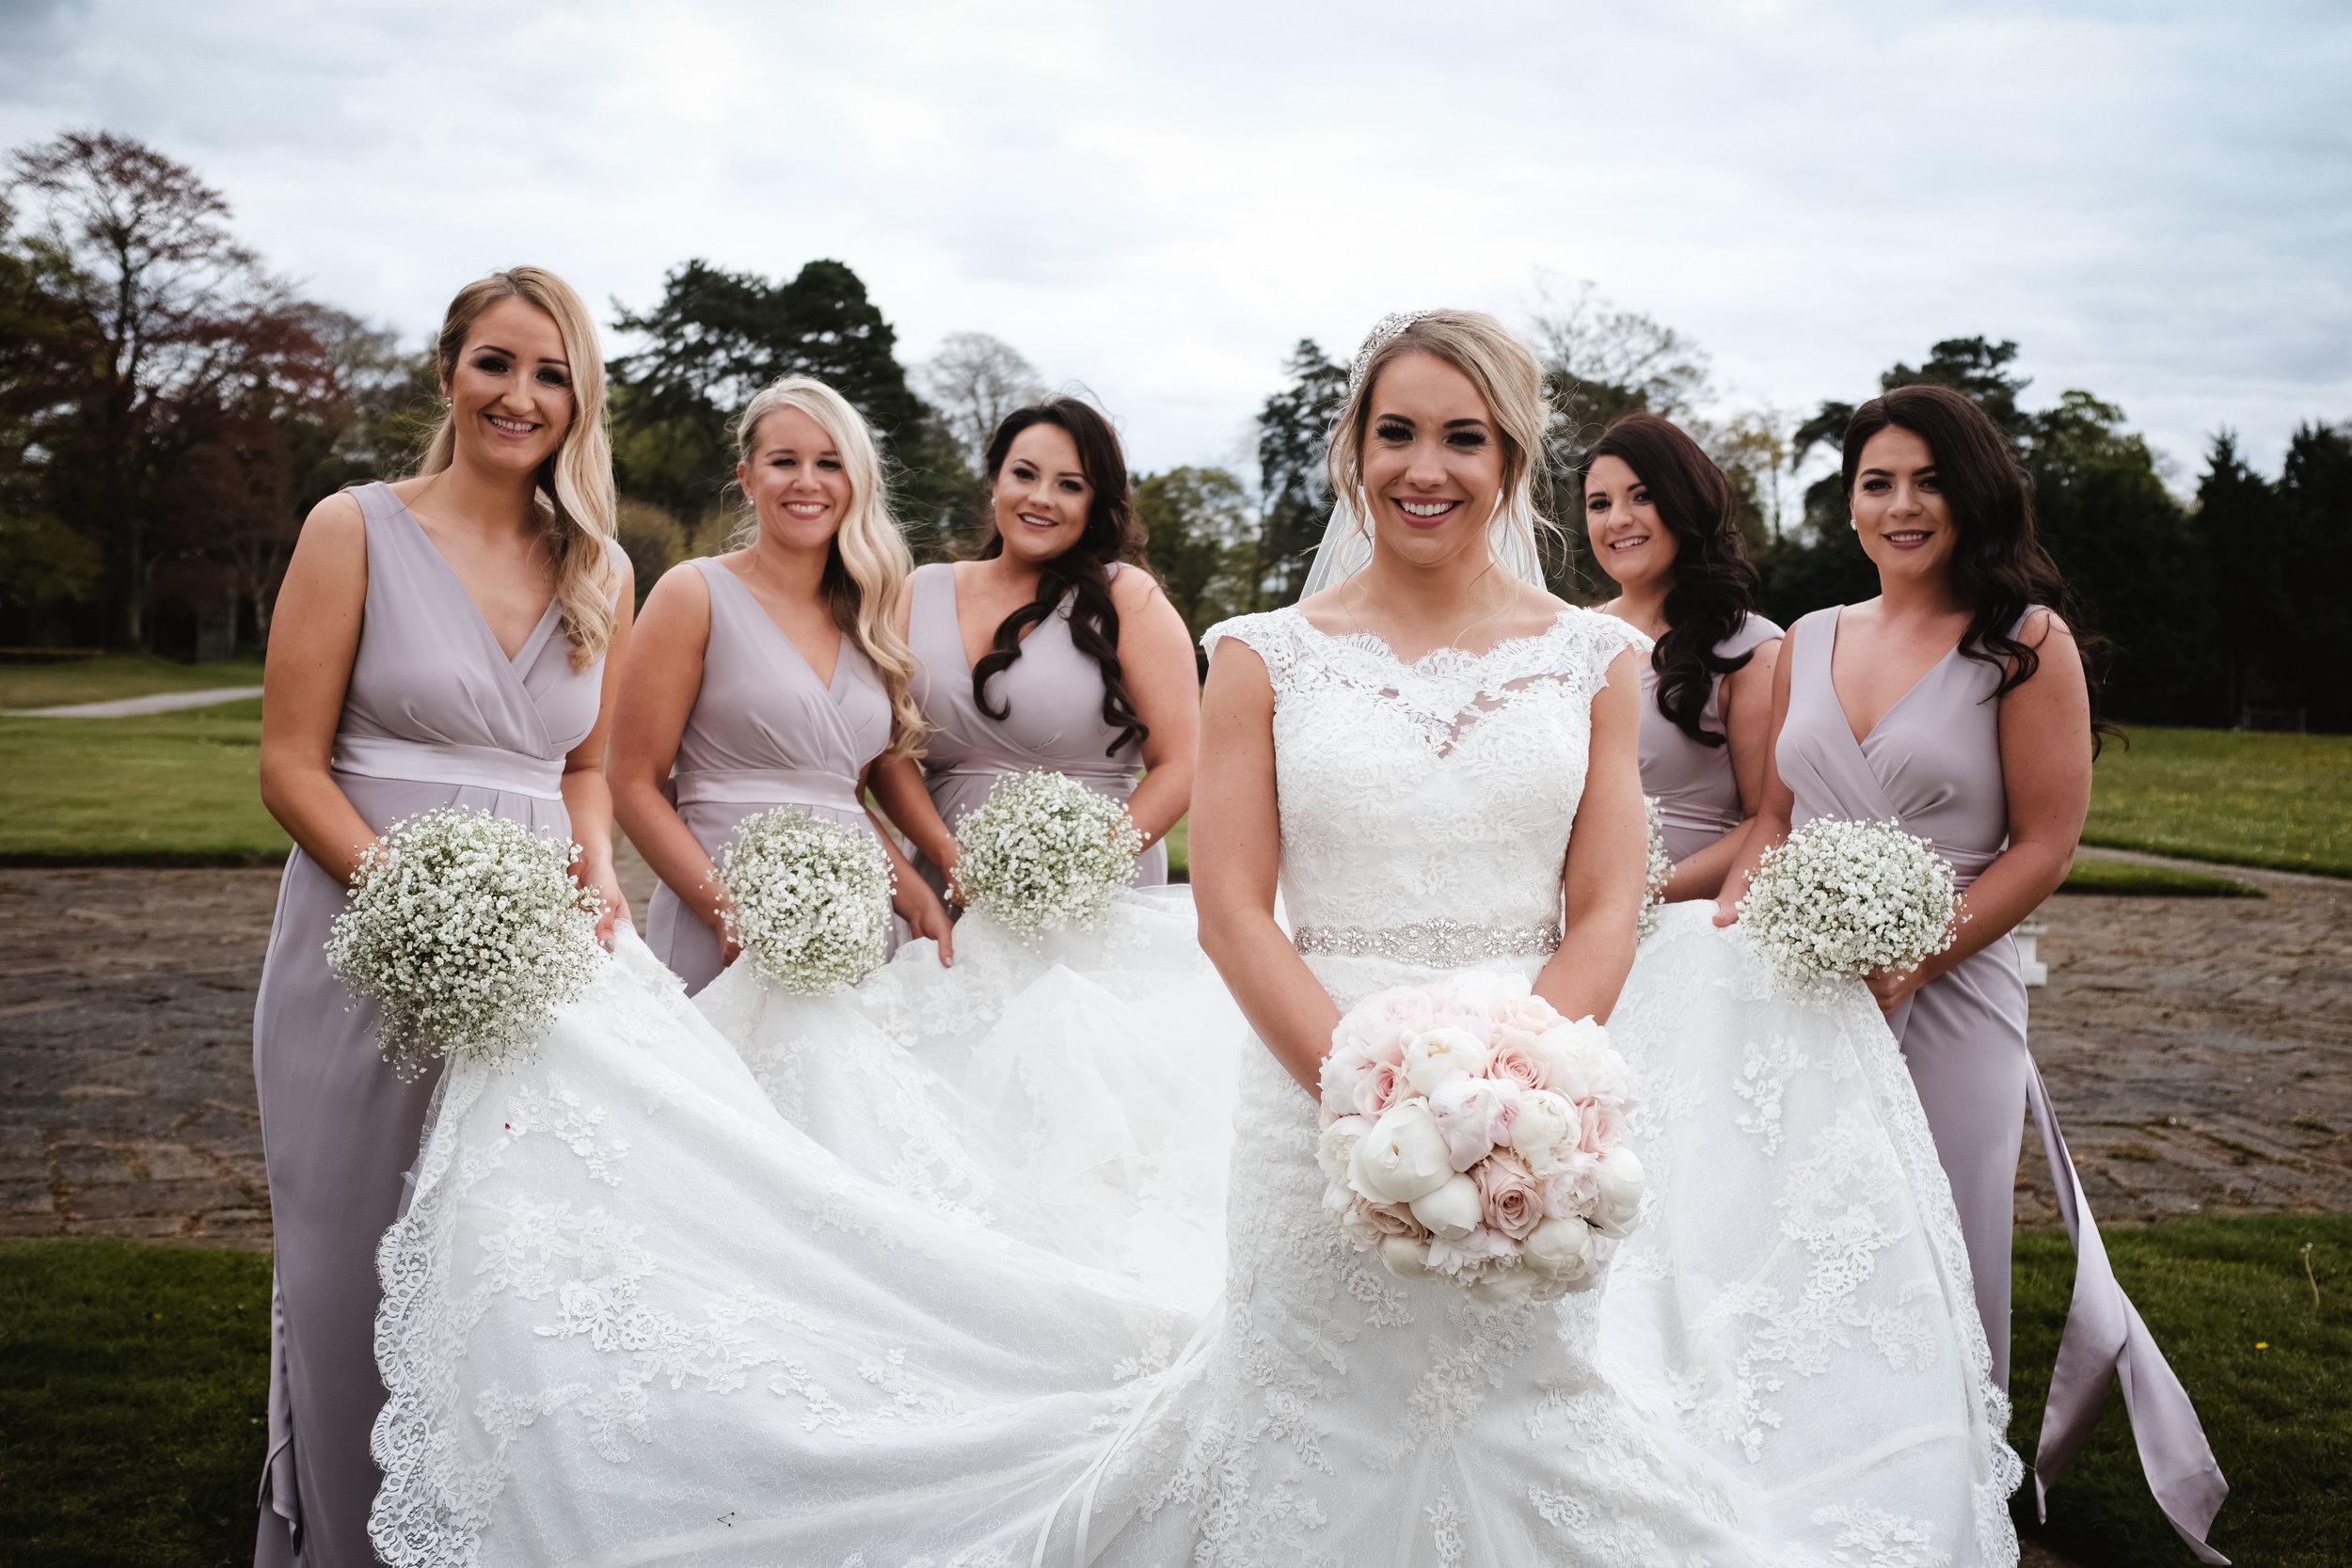 Thornton manor wedding photography cheshire wedding photographer liverpool manchester warrington chester wirral wedding BLOG (51 of 108).jpg